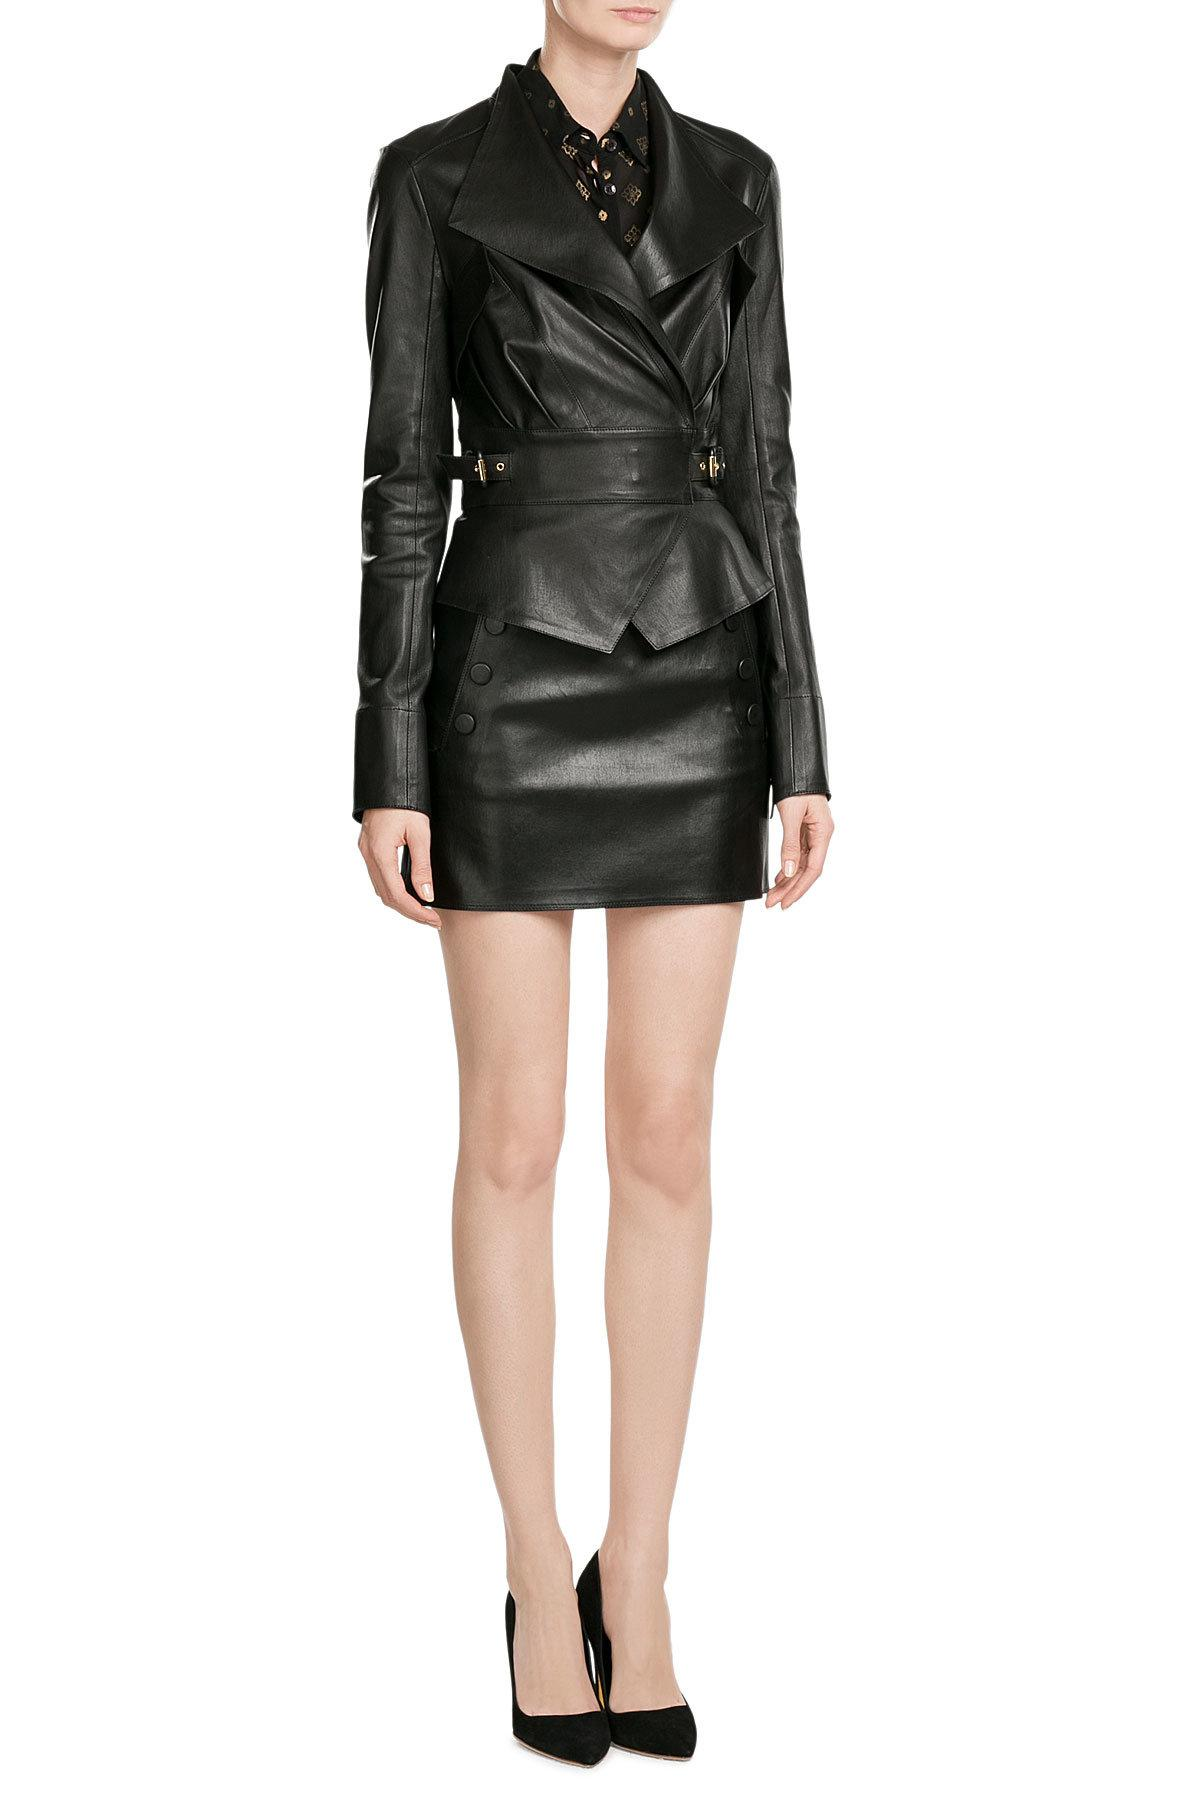 Lyst Jitrois Leather Mini Skirt In Black